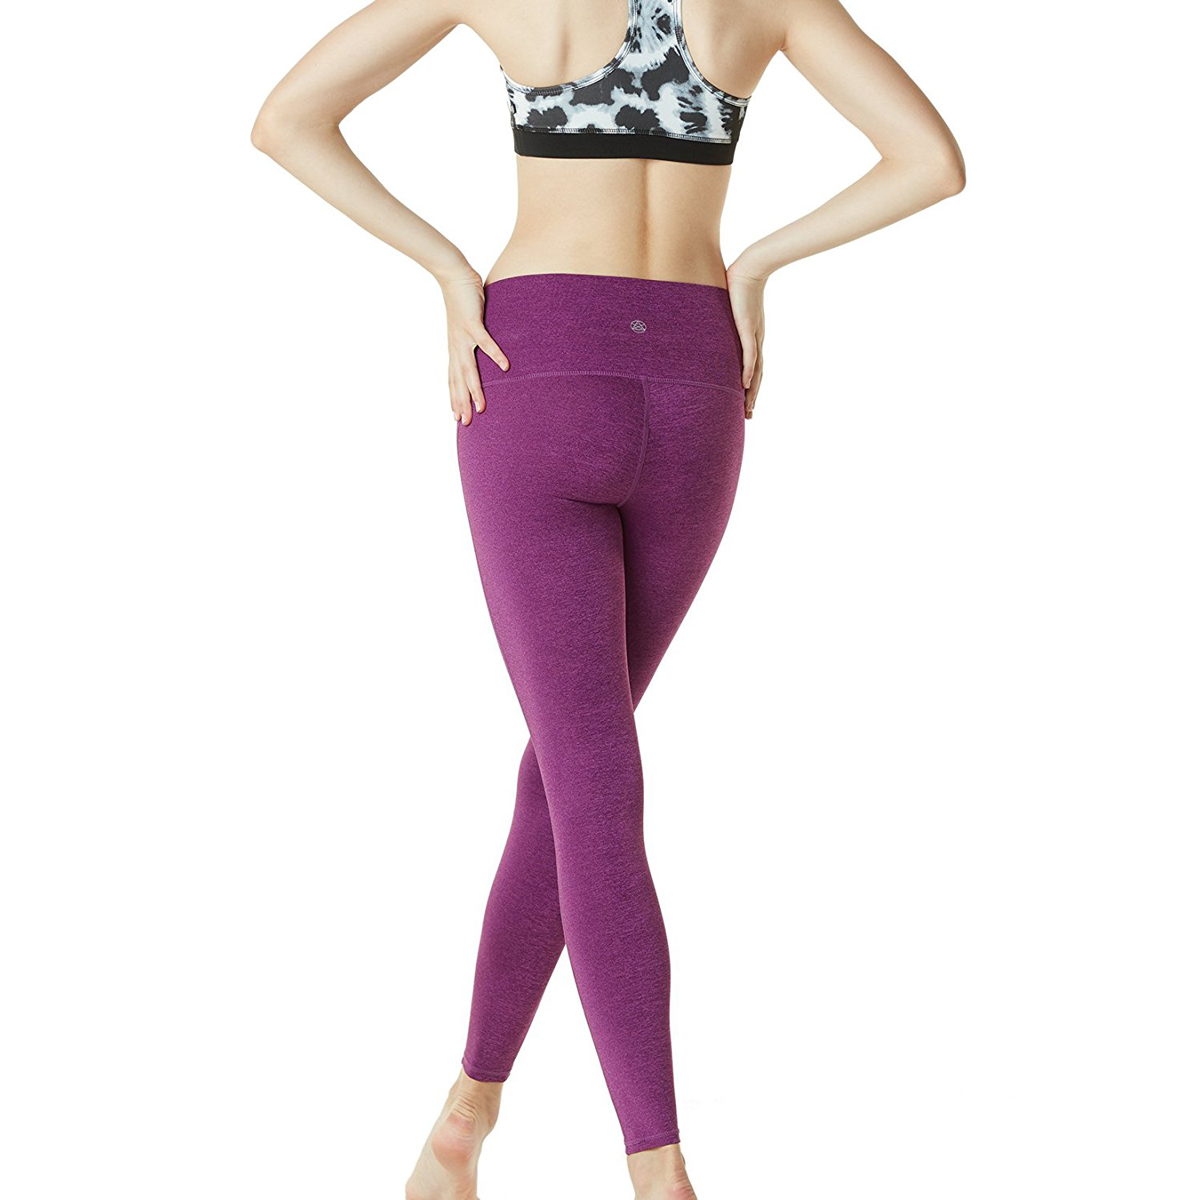 thumbnail 20 - TSLA Tesla FYP42 Women's High-Waisted Ultra-Stretch Tummy Control Yoga Pants